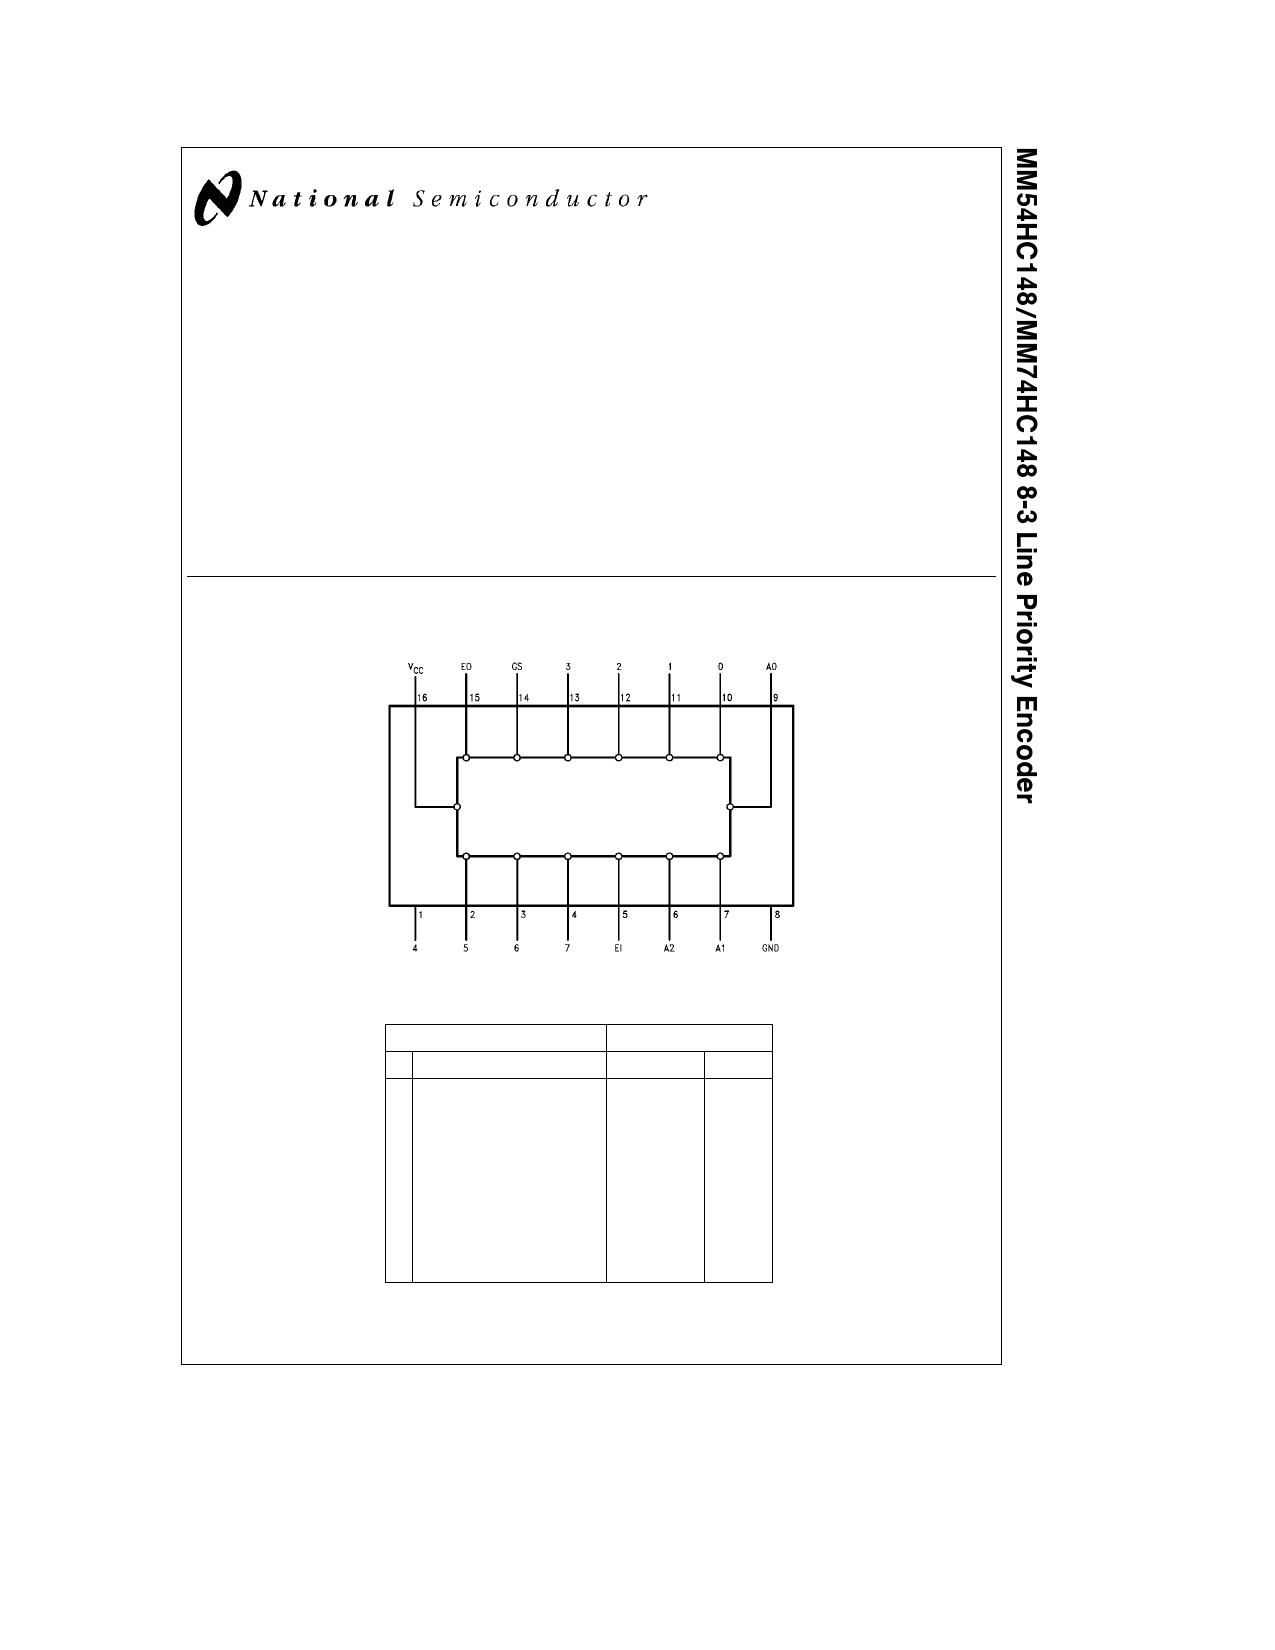 8 to 3 line priority encoder logic diagram